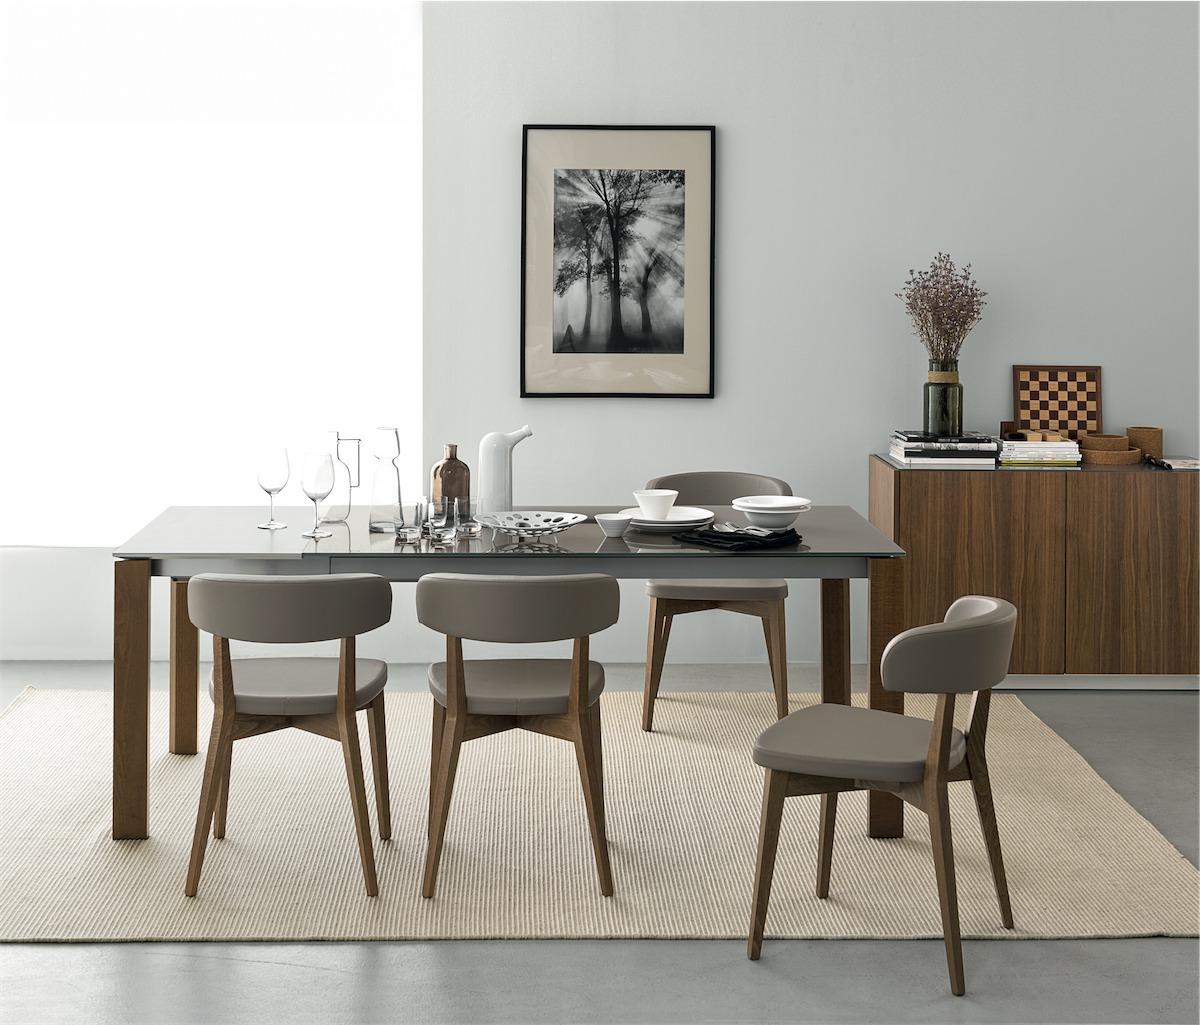 Sedia siren connubia by calligaris linea tavoli e sedie for Calligaris sgabelli